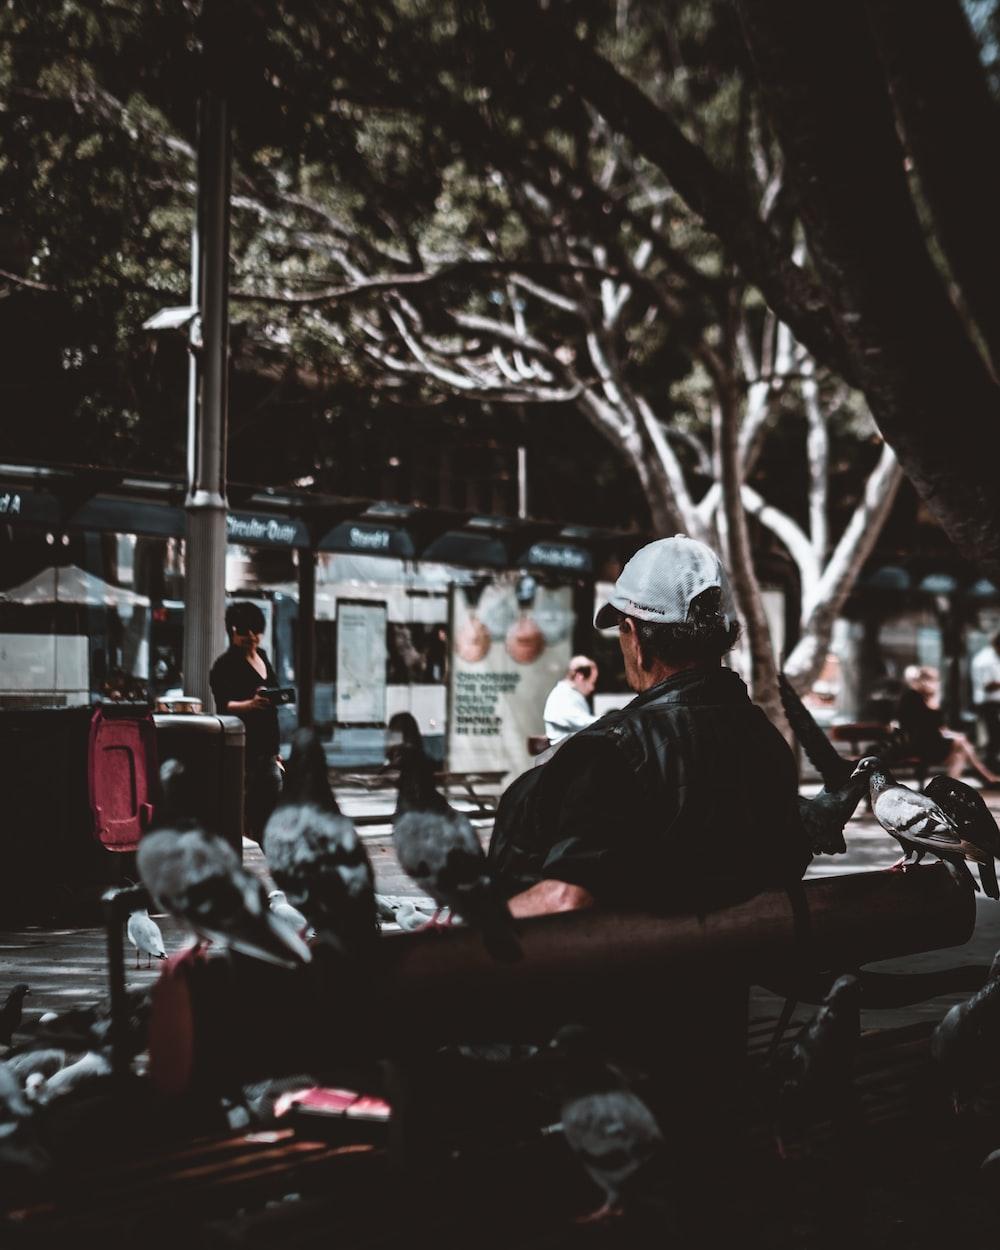 man sitting on bench near people